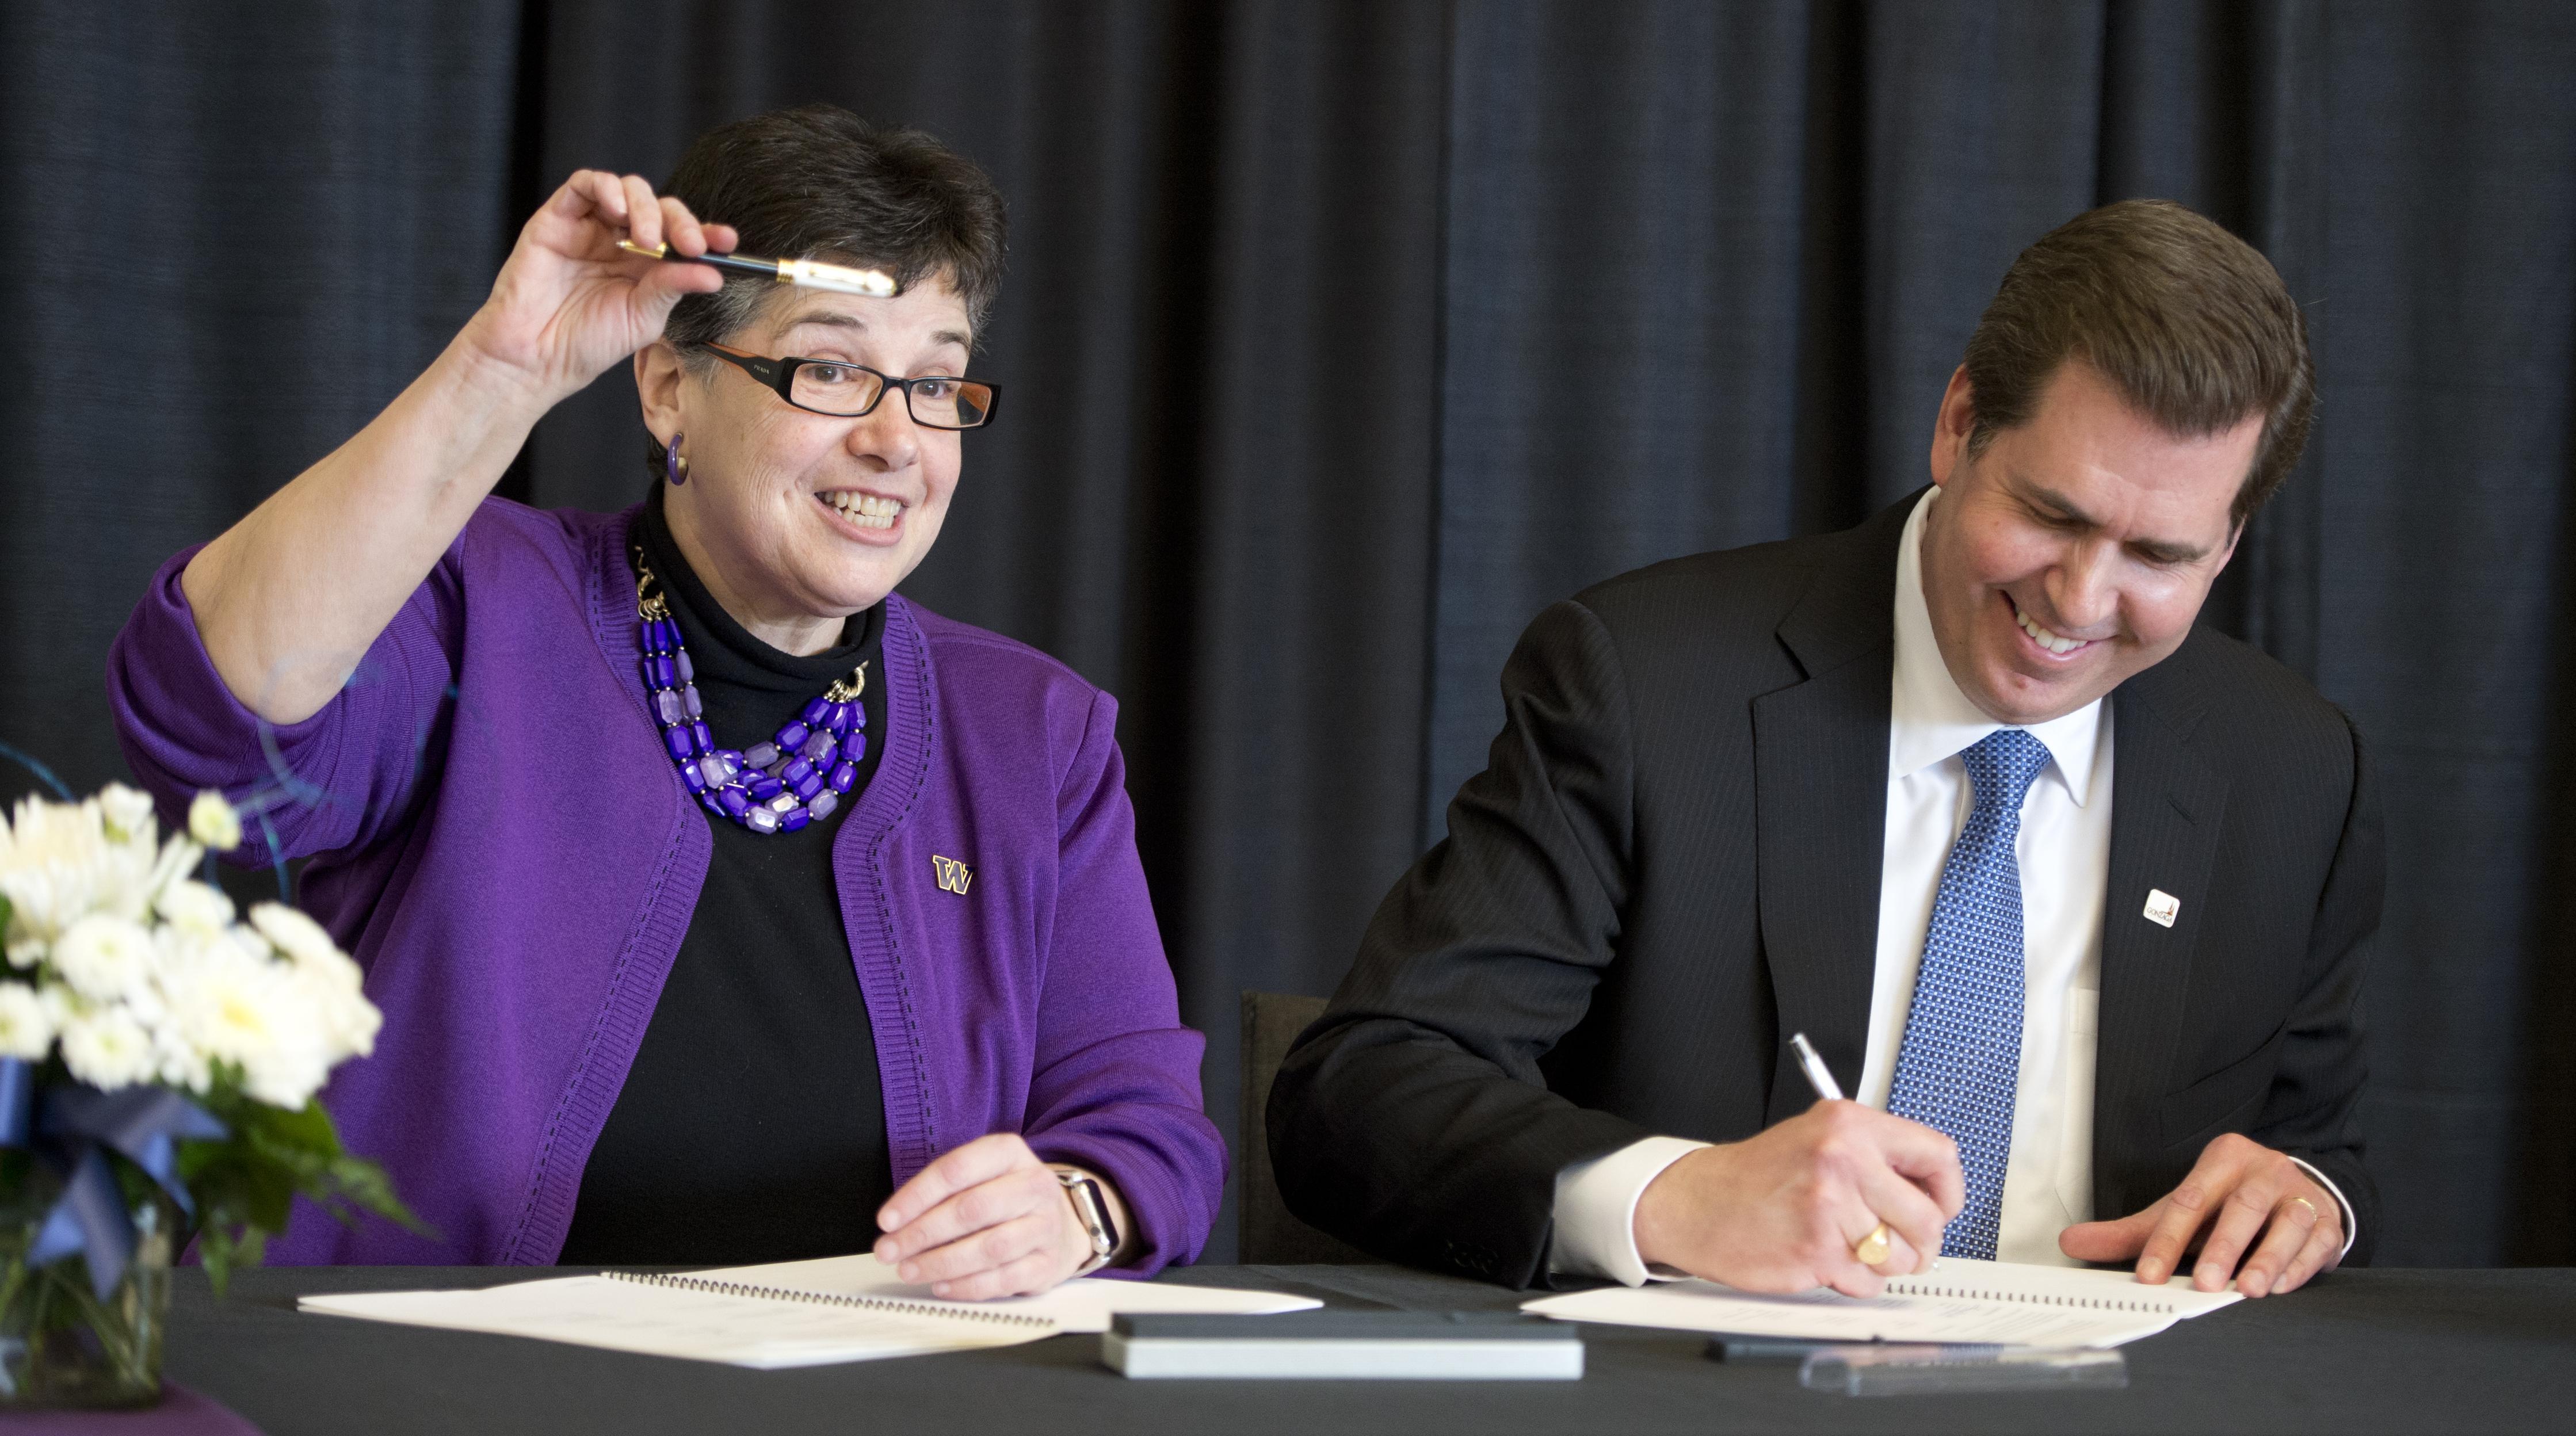 3ee6ecc1b8 University of Washington President Ana Marie Cauce, left, shows off her  Gonzaga pen while